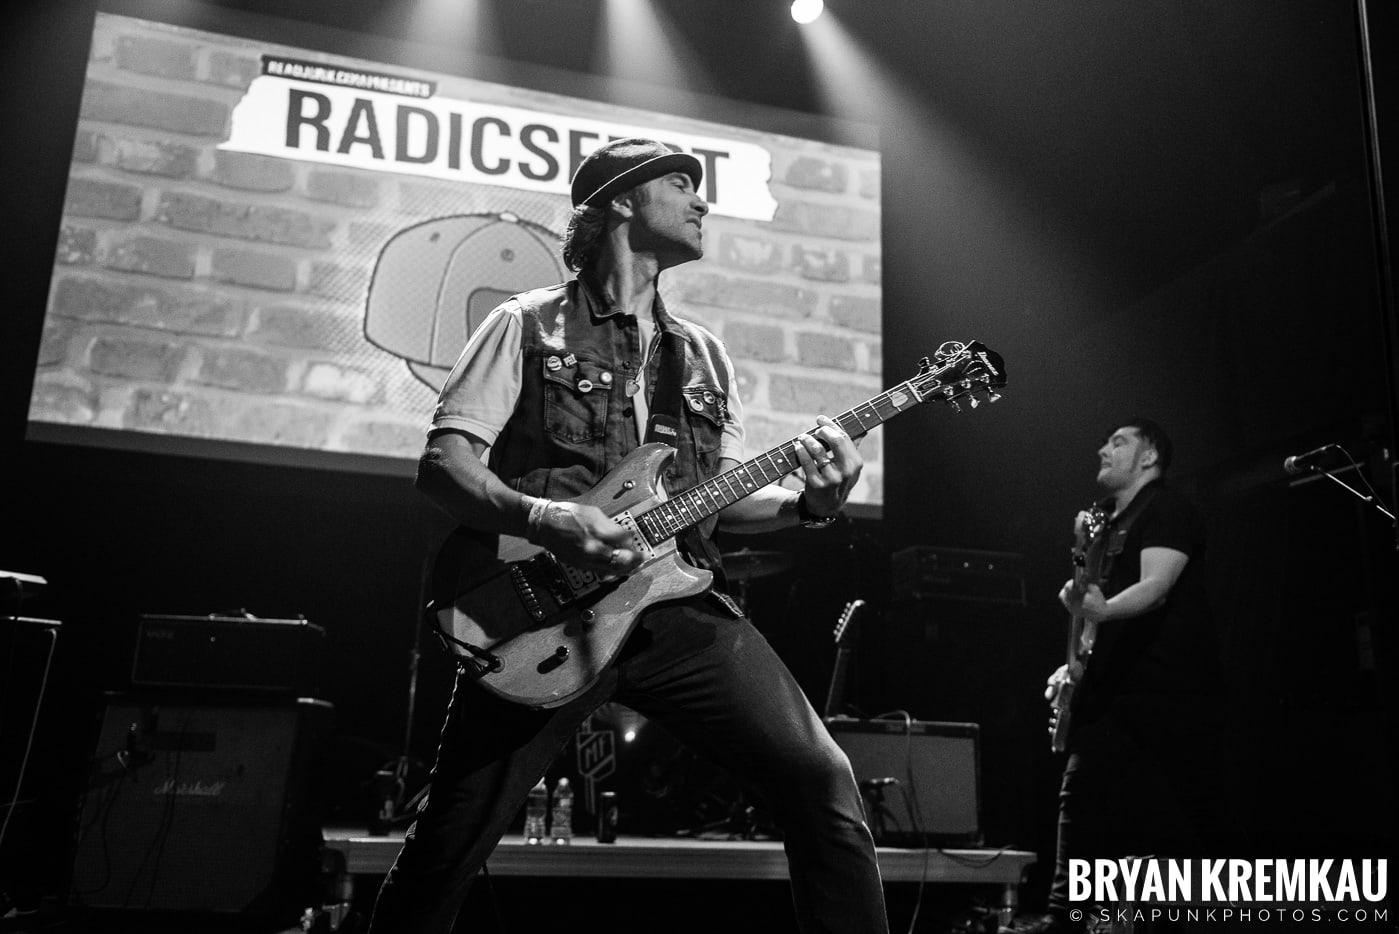 Spring Heeled Jack @ Radicsfest, Gramercy Theatre, NYC - 7.19.19 (63)